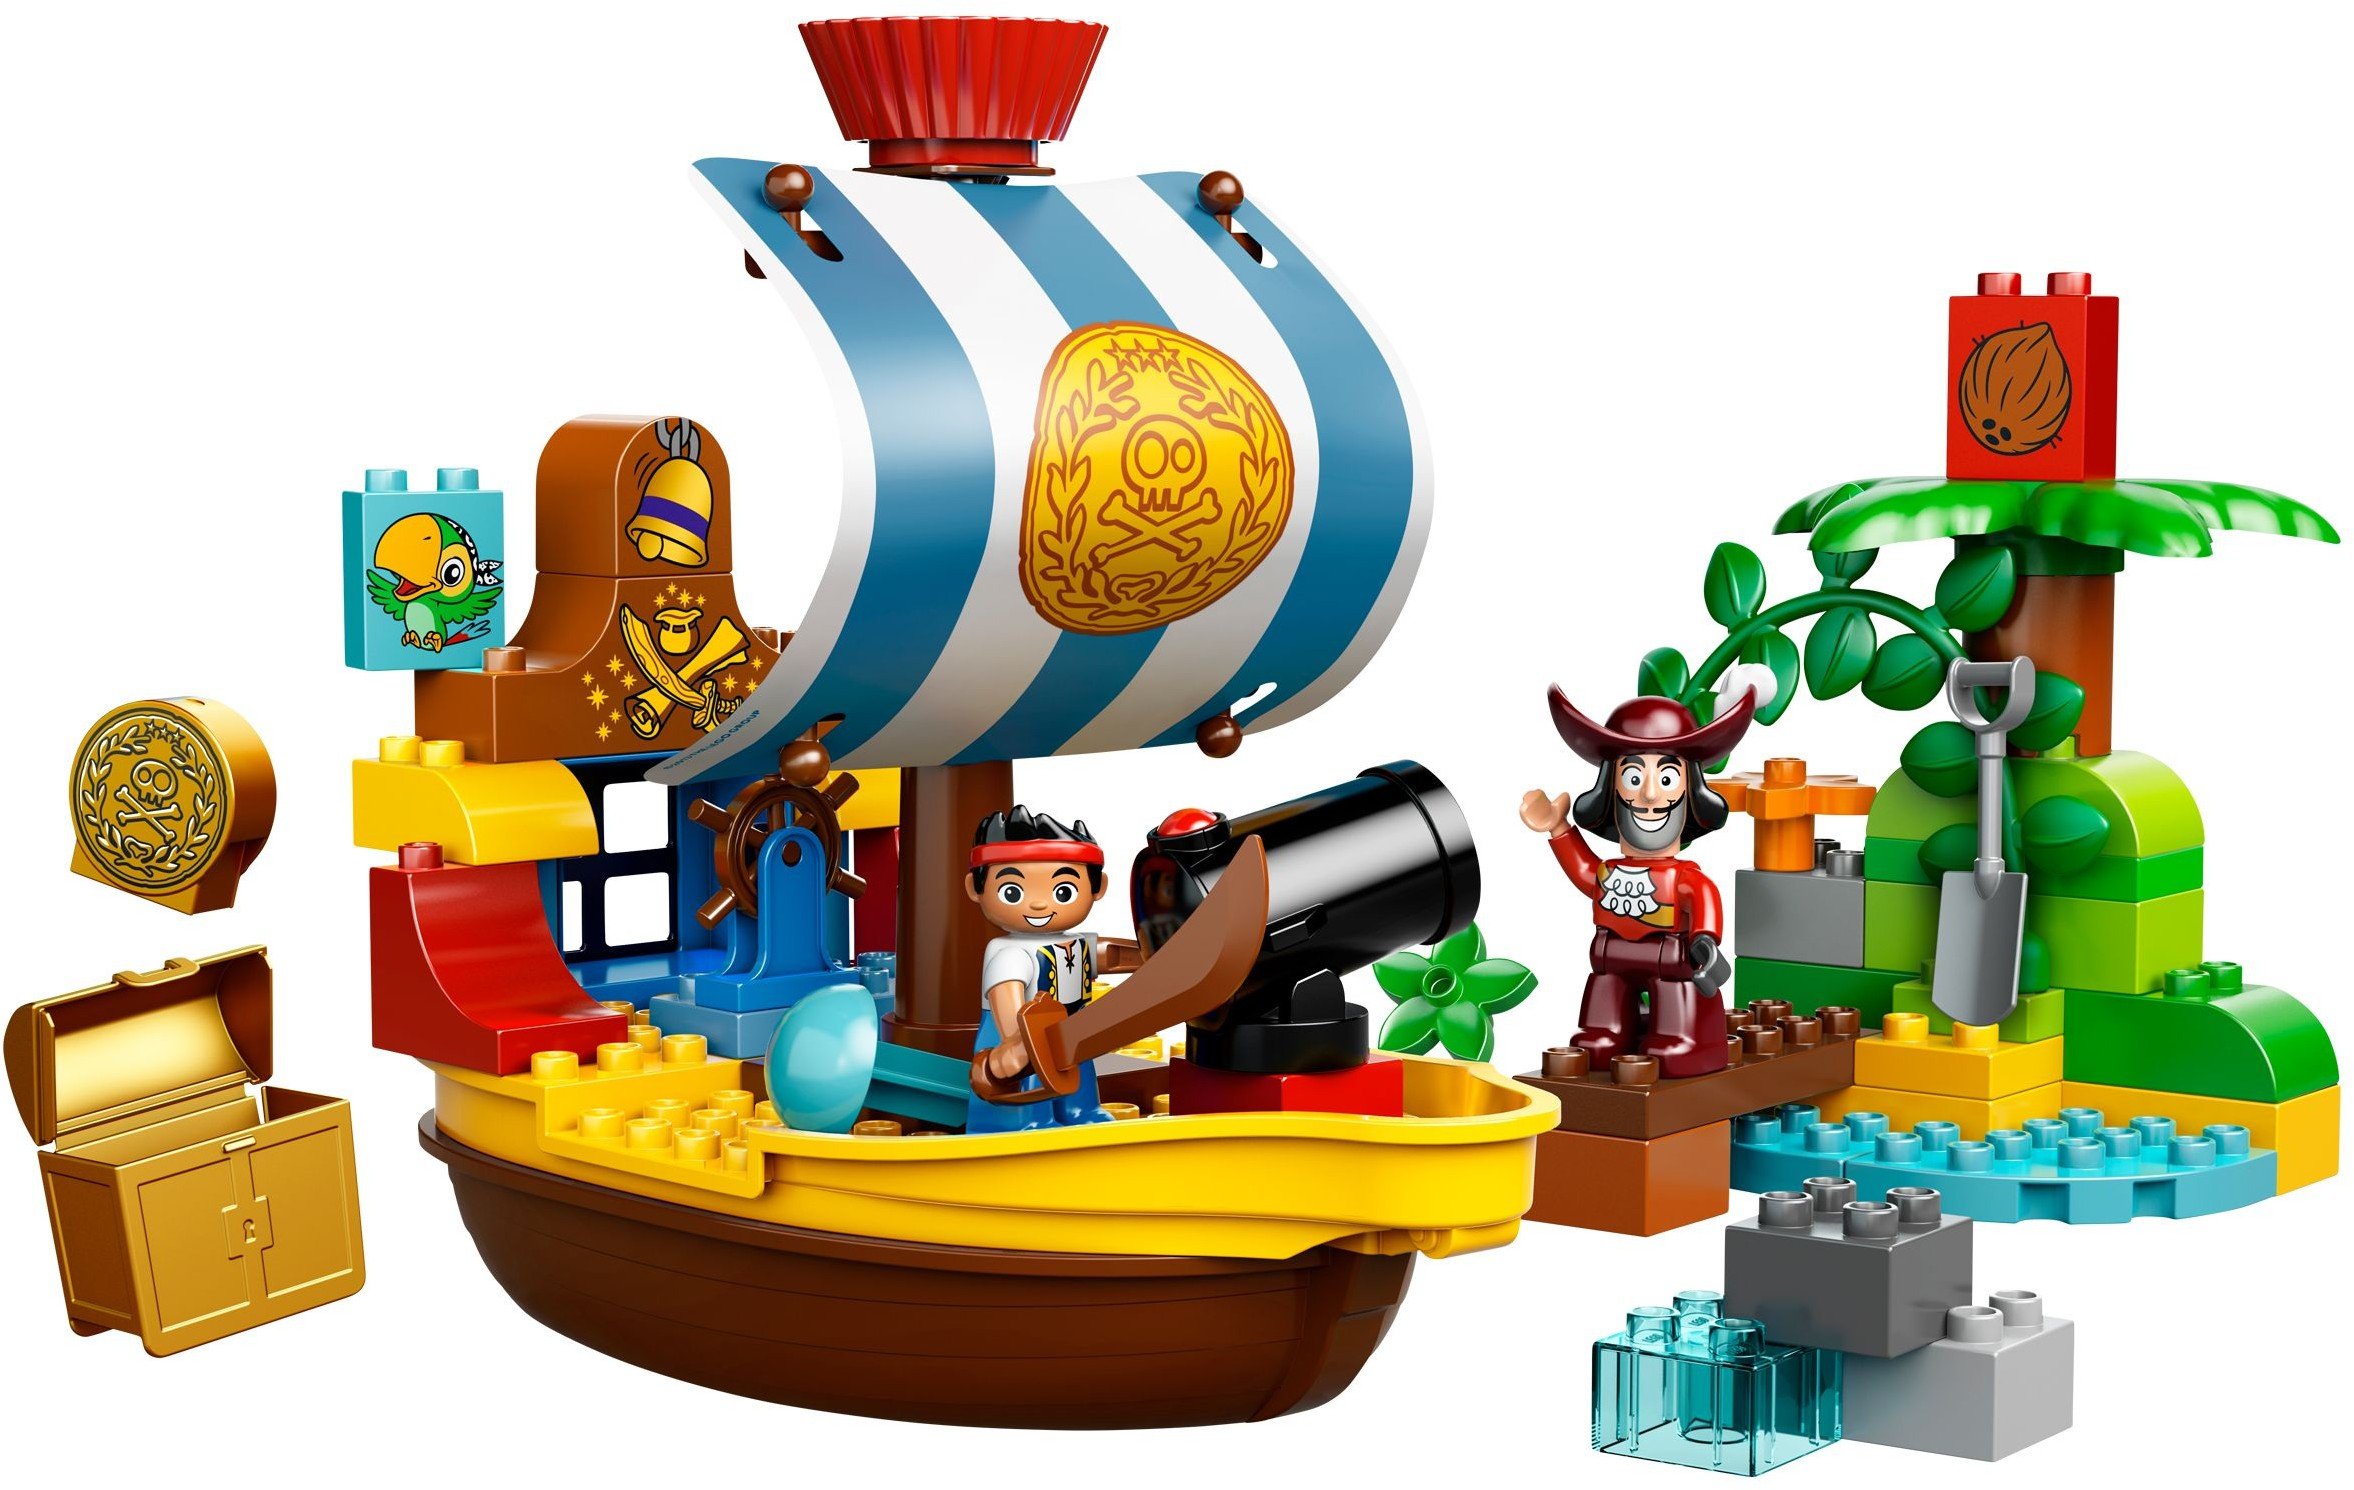 duplo jake and the never land pirates brickset lego set guide